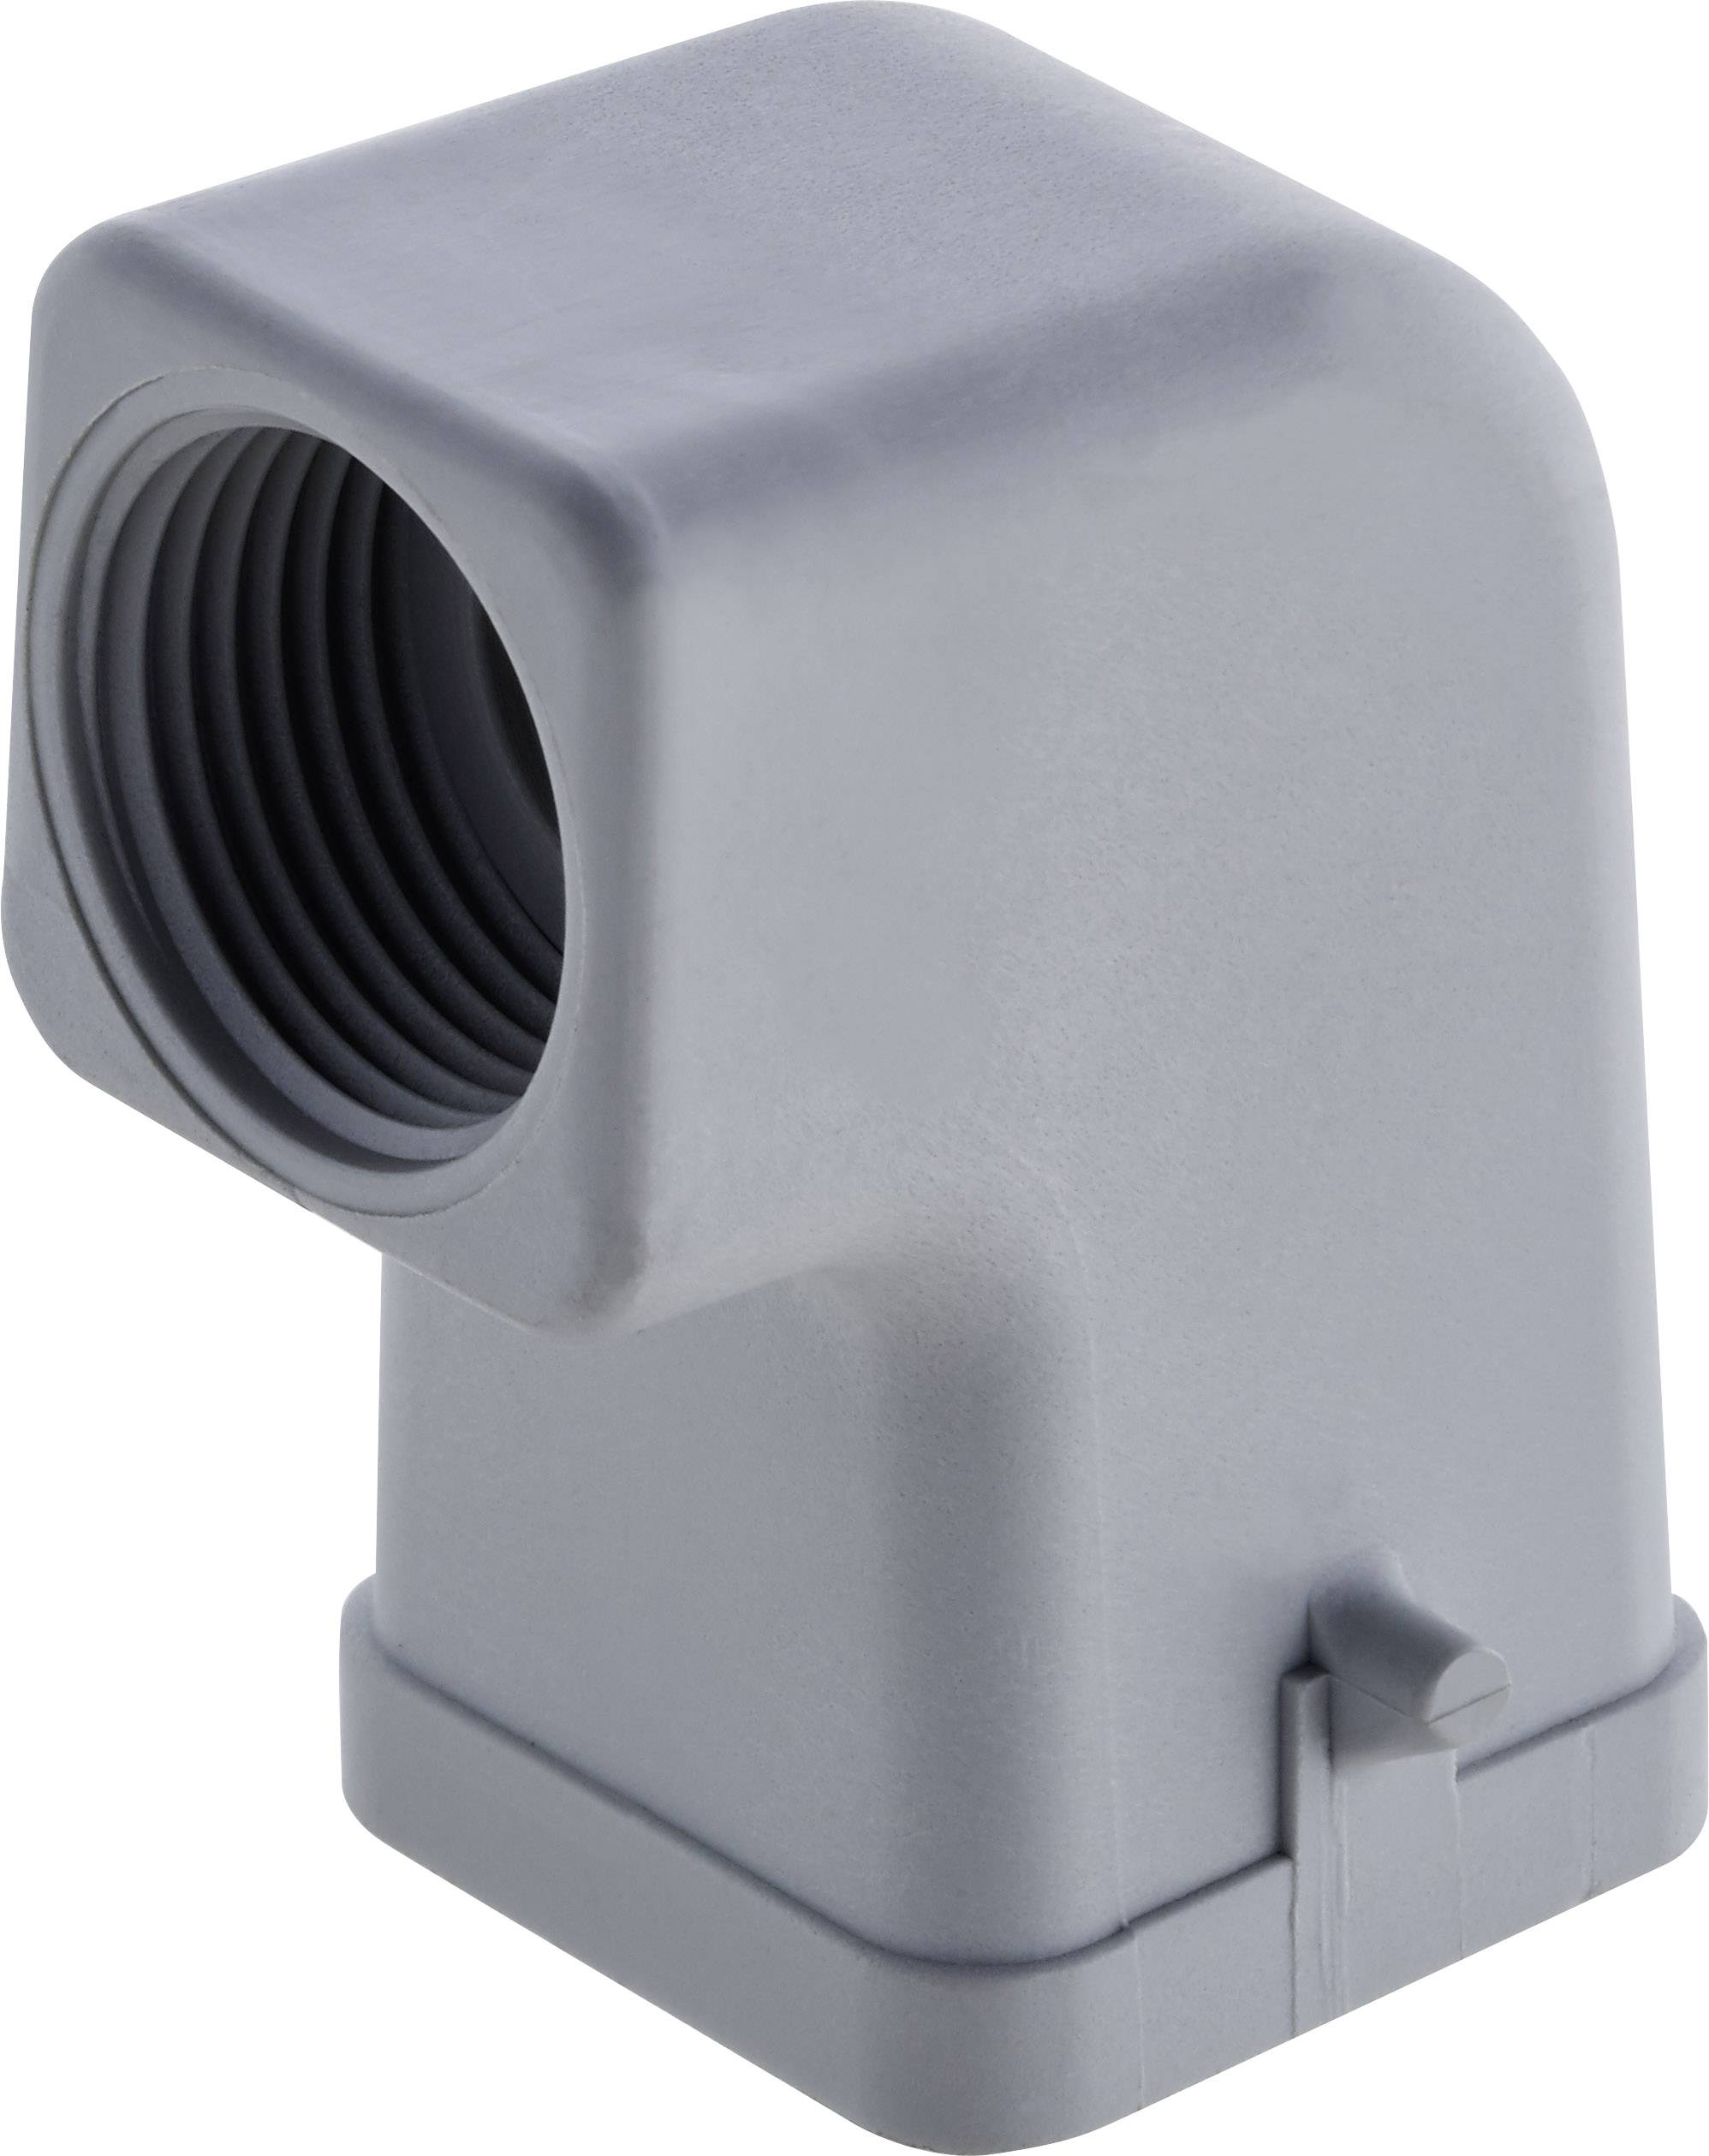 Pouzdro Amphenol C146 30R003 500 4, 1 ks